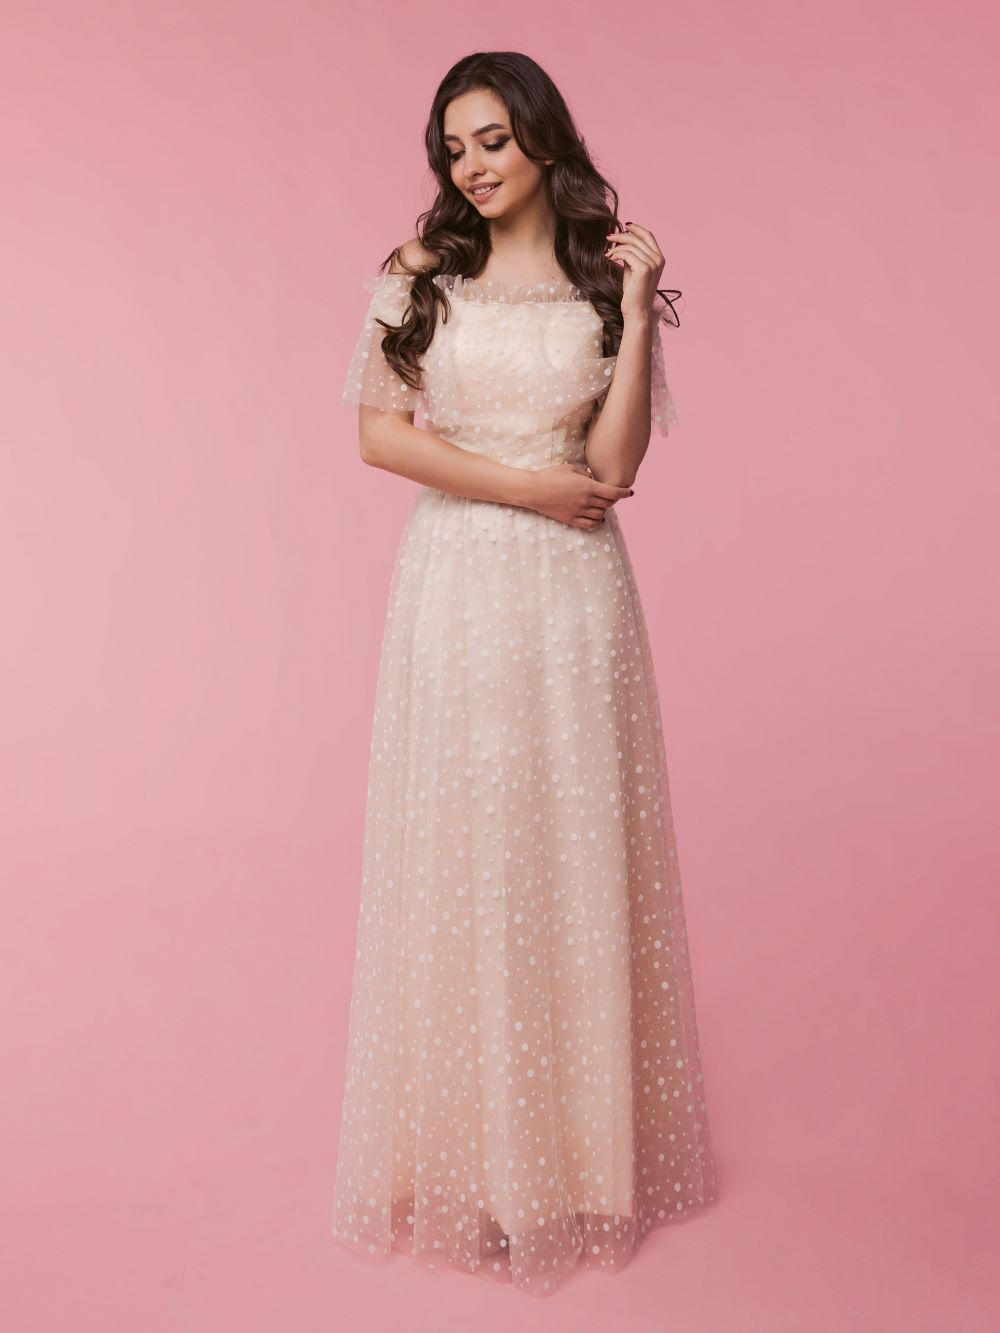 Свадебное платье Прада-2 2